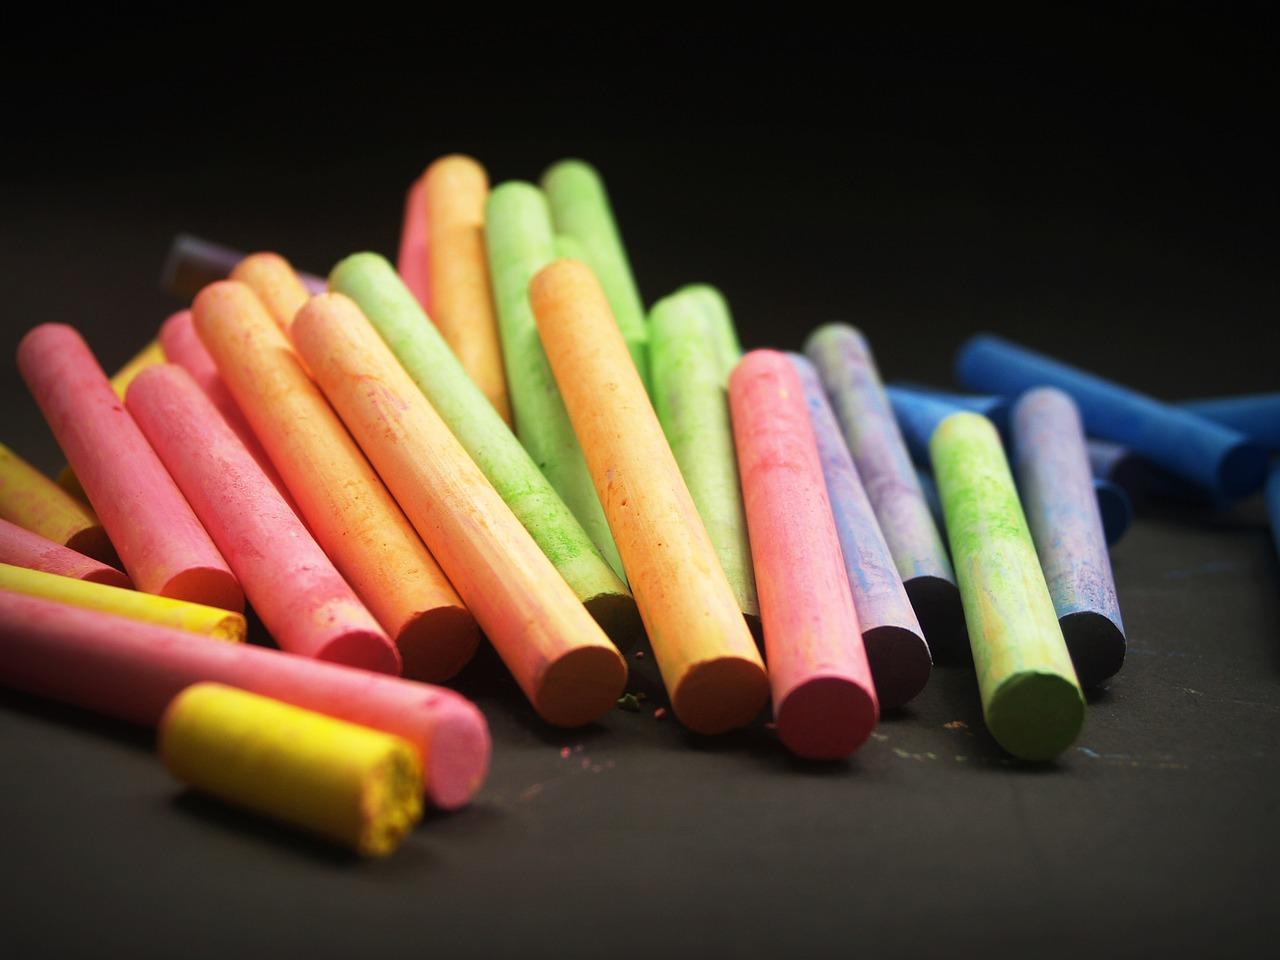 chalk-1869492_1280